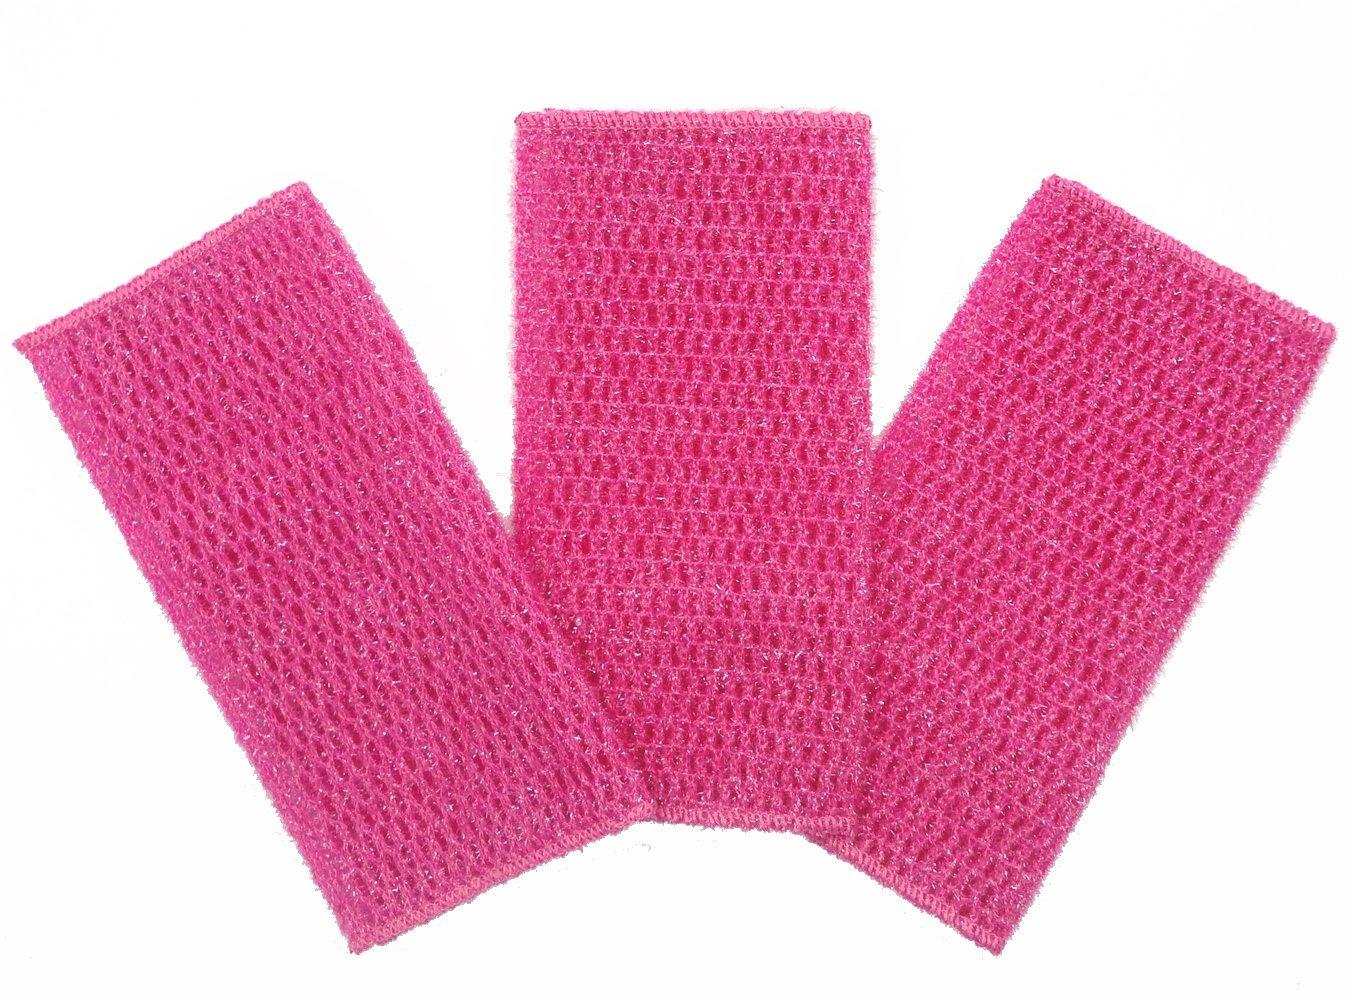 KLEIESH Dish Cloth for All Purpose Dish Washing 3 Pack (7''x9'', Deep Pink)